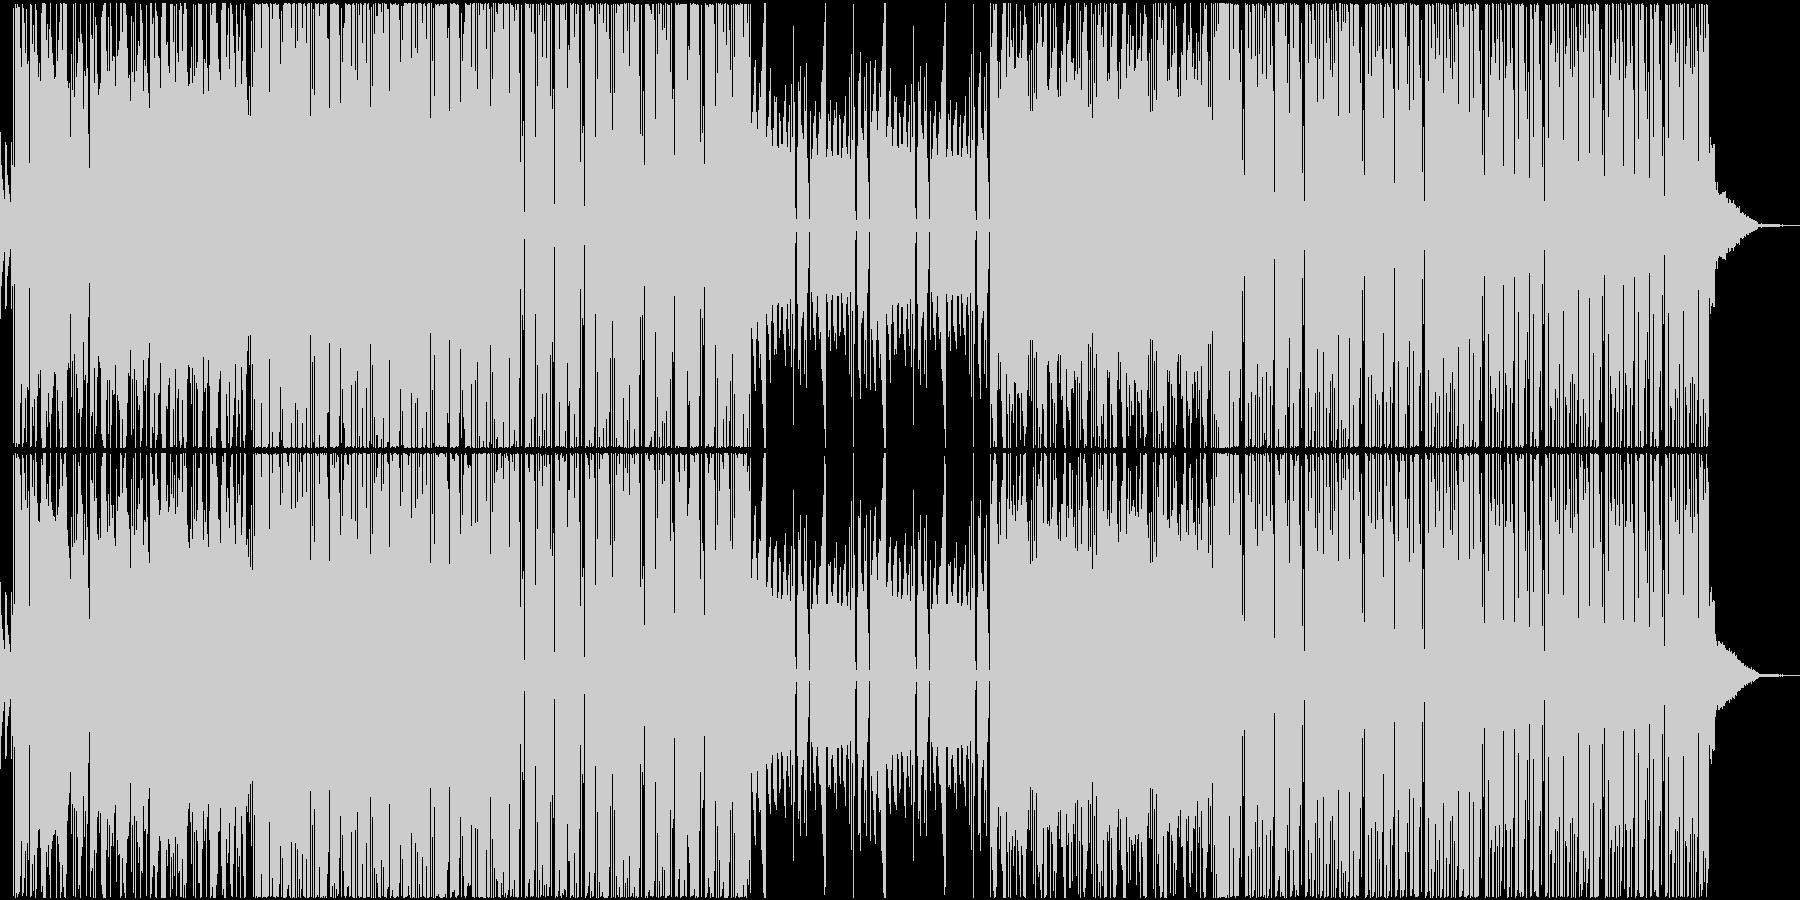 TRAP EDM ダンス HIPHOPの未再生の波形